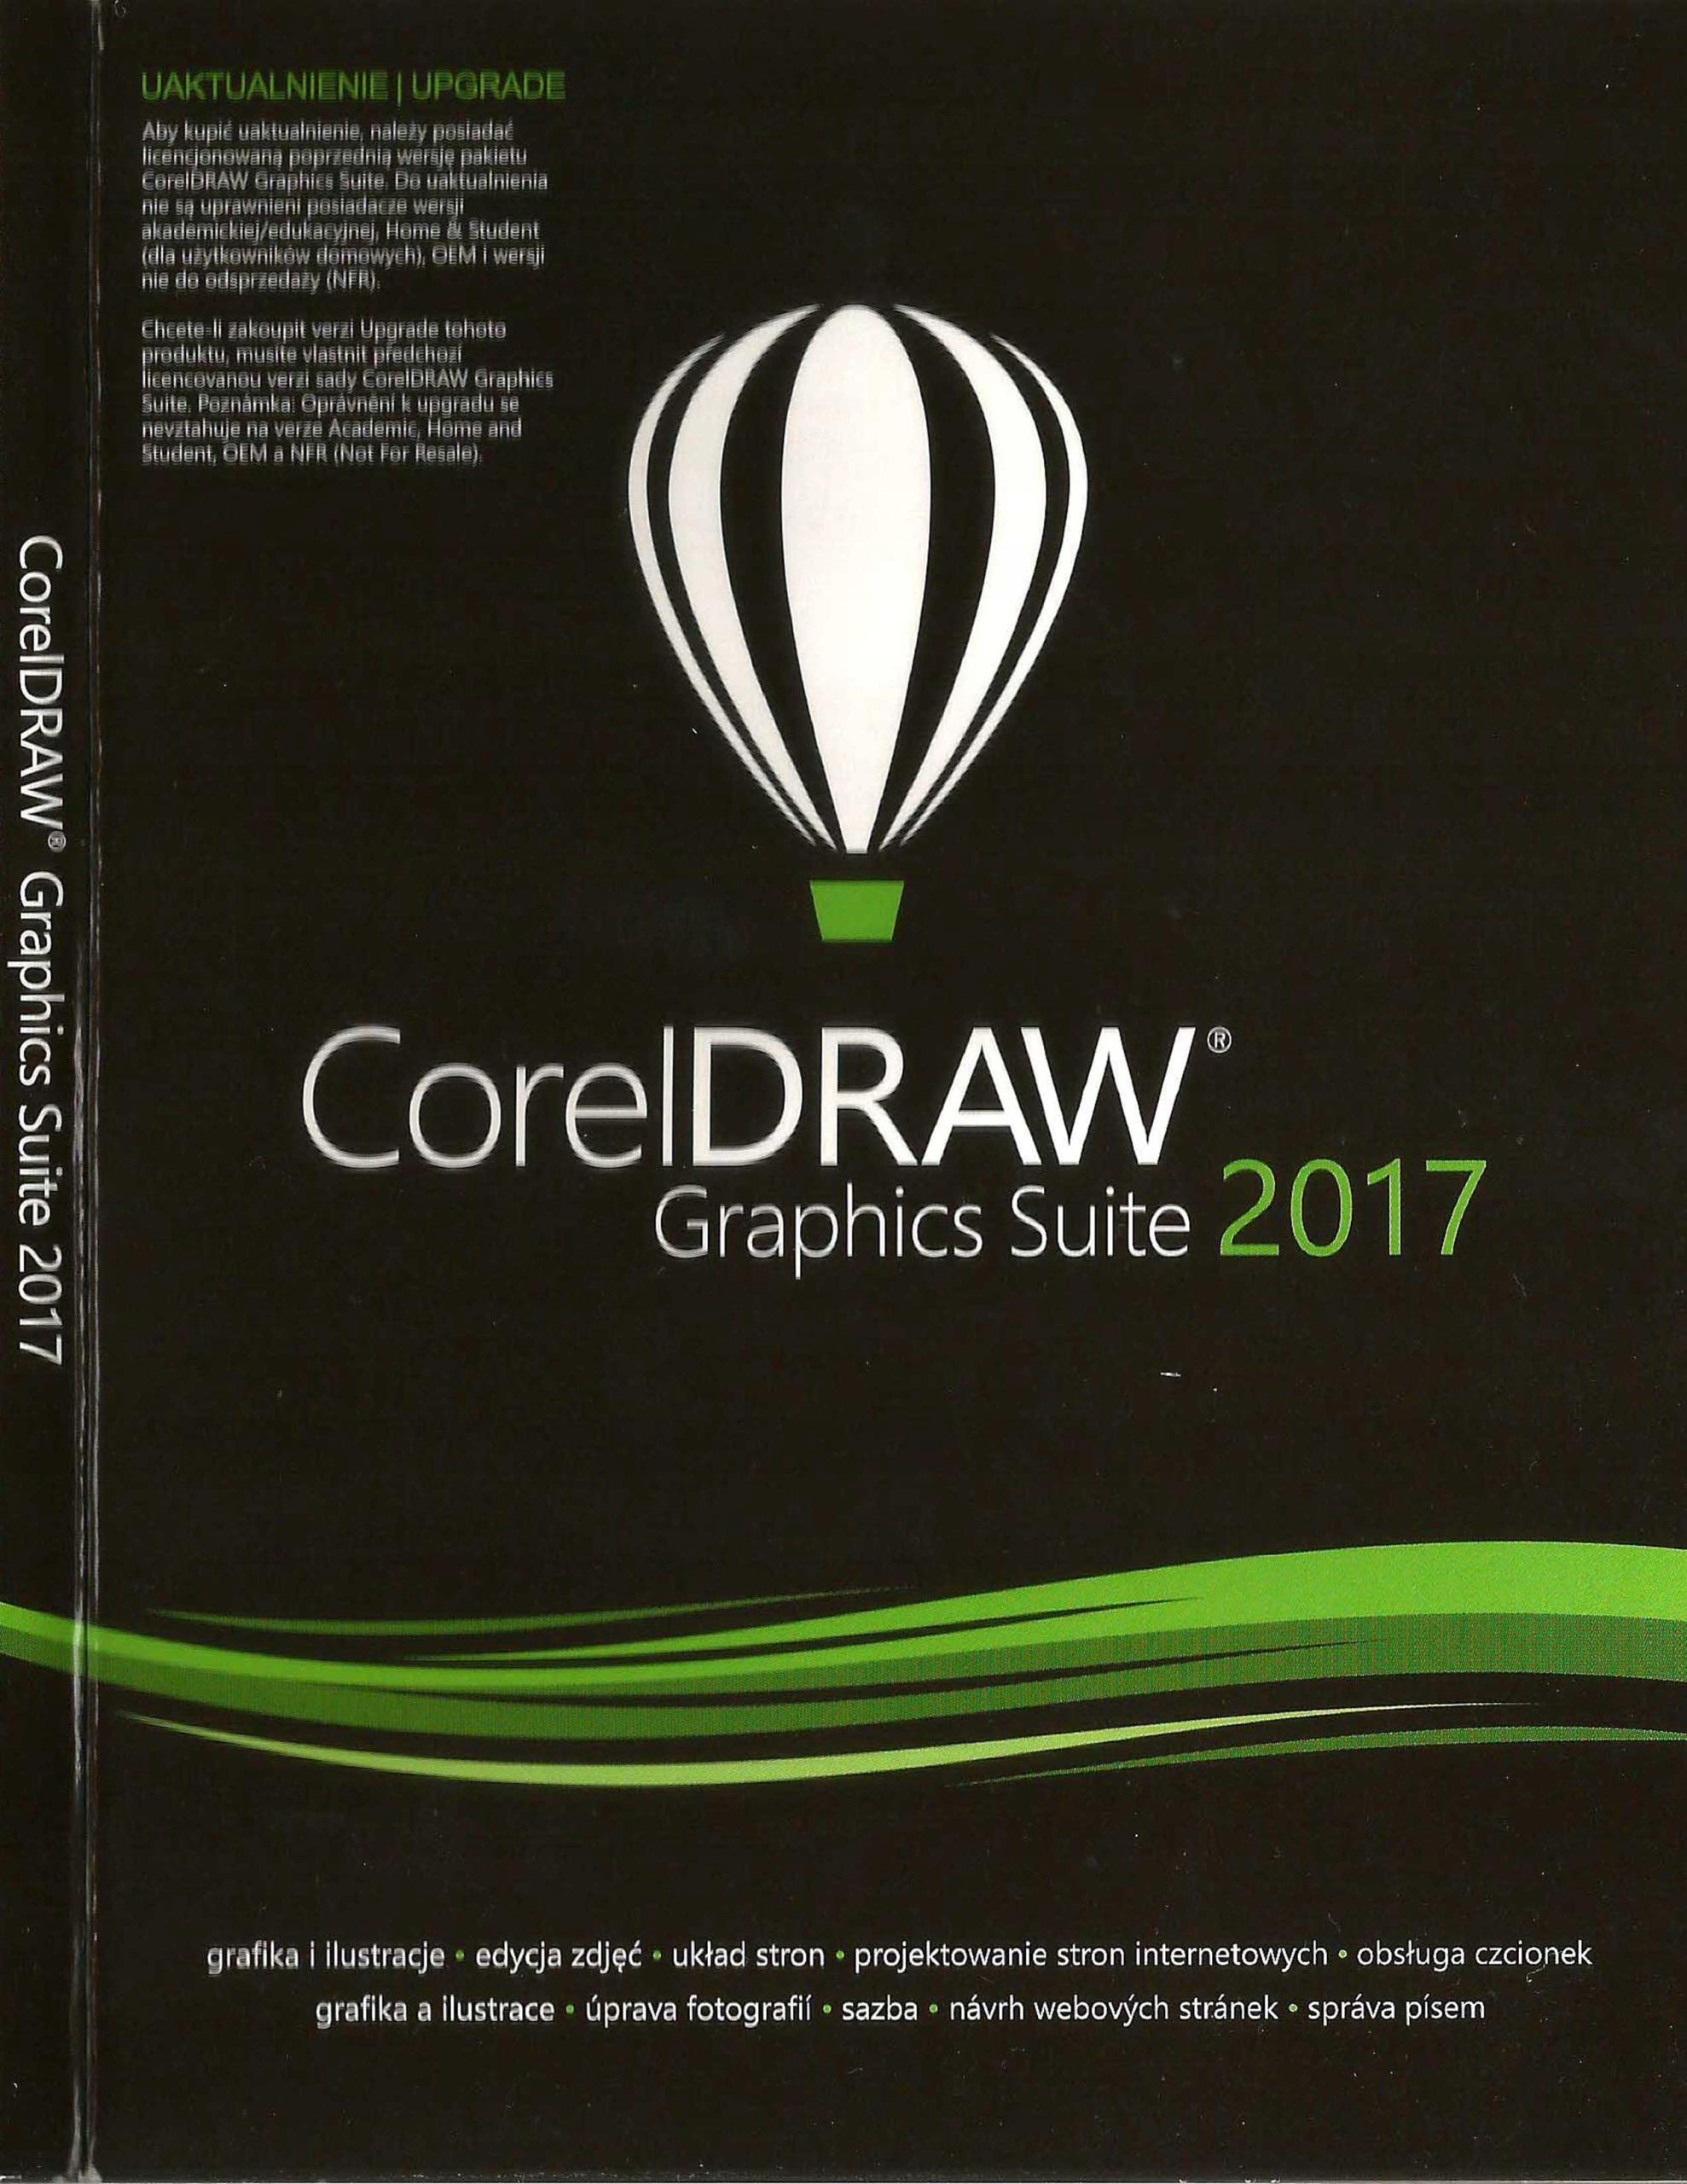 CorelDRAW Graphics Suite 2017 PL Corel Draw